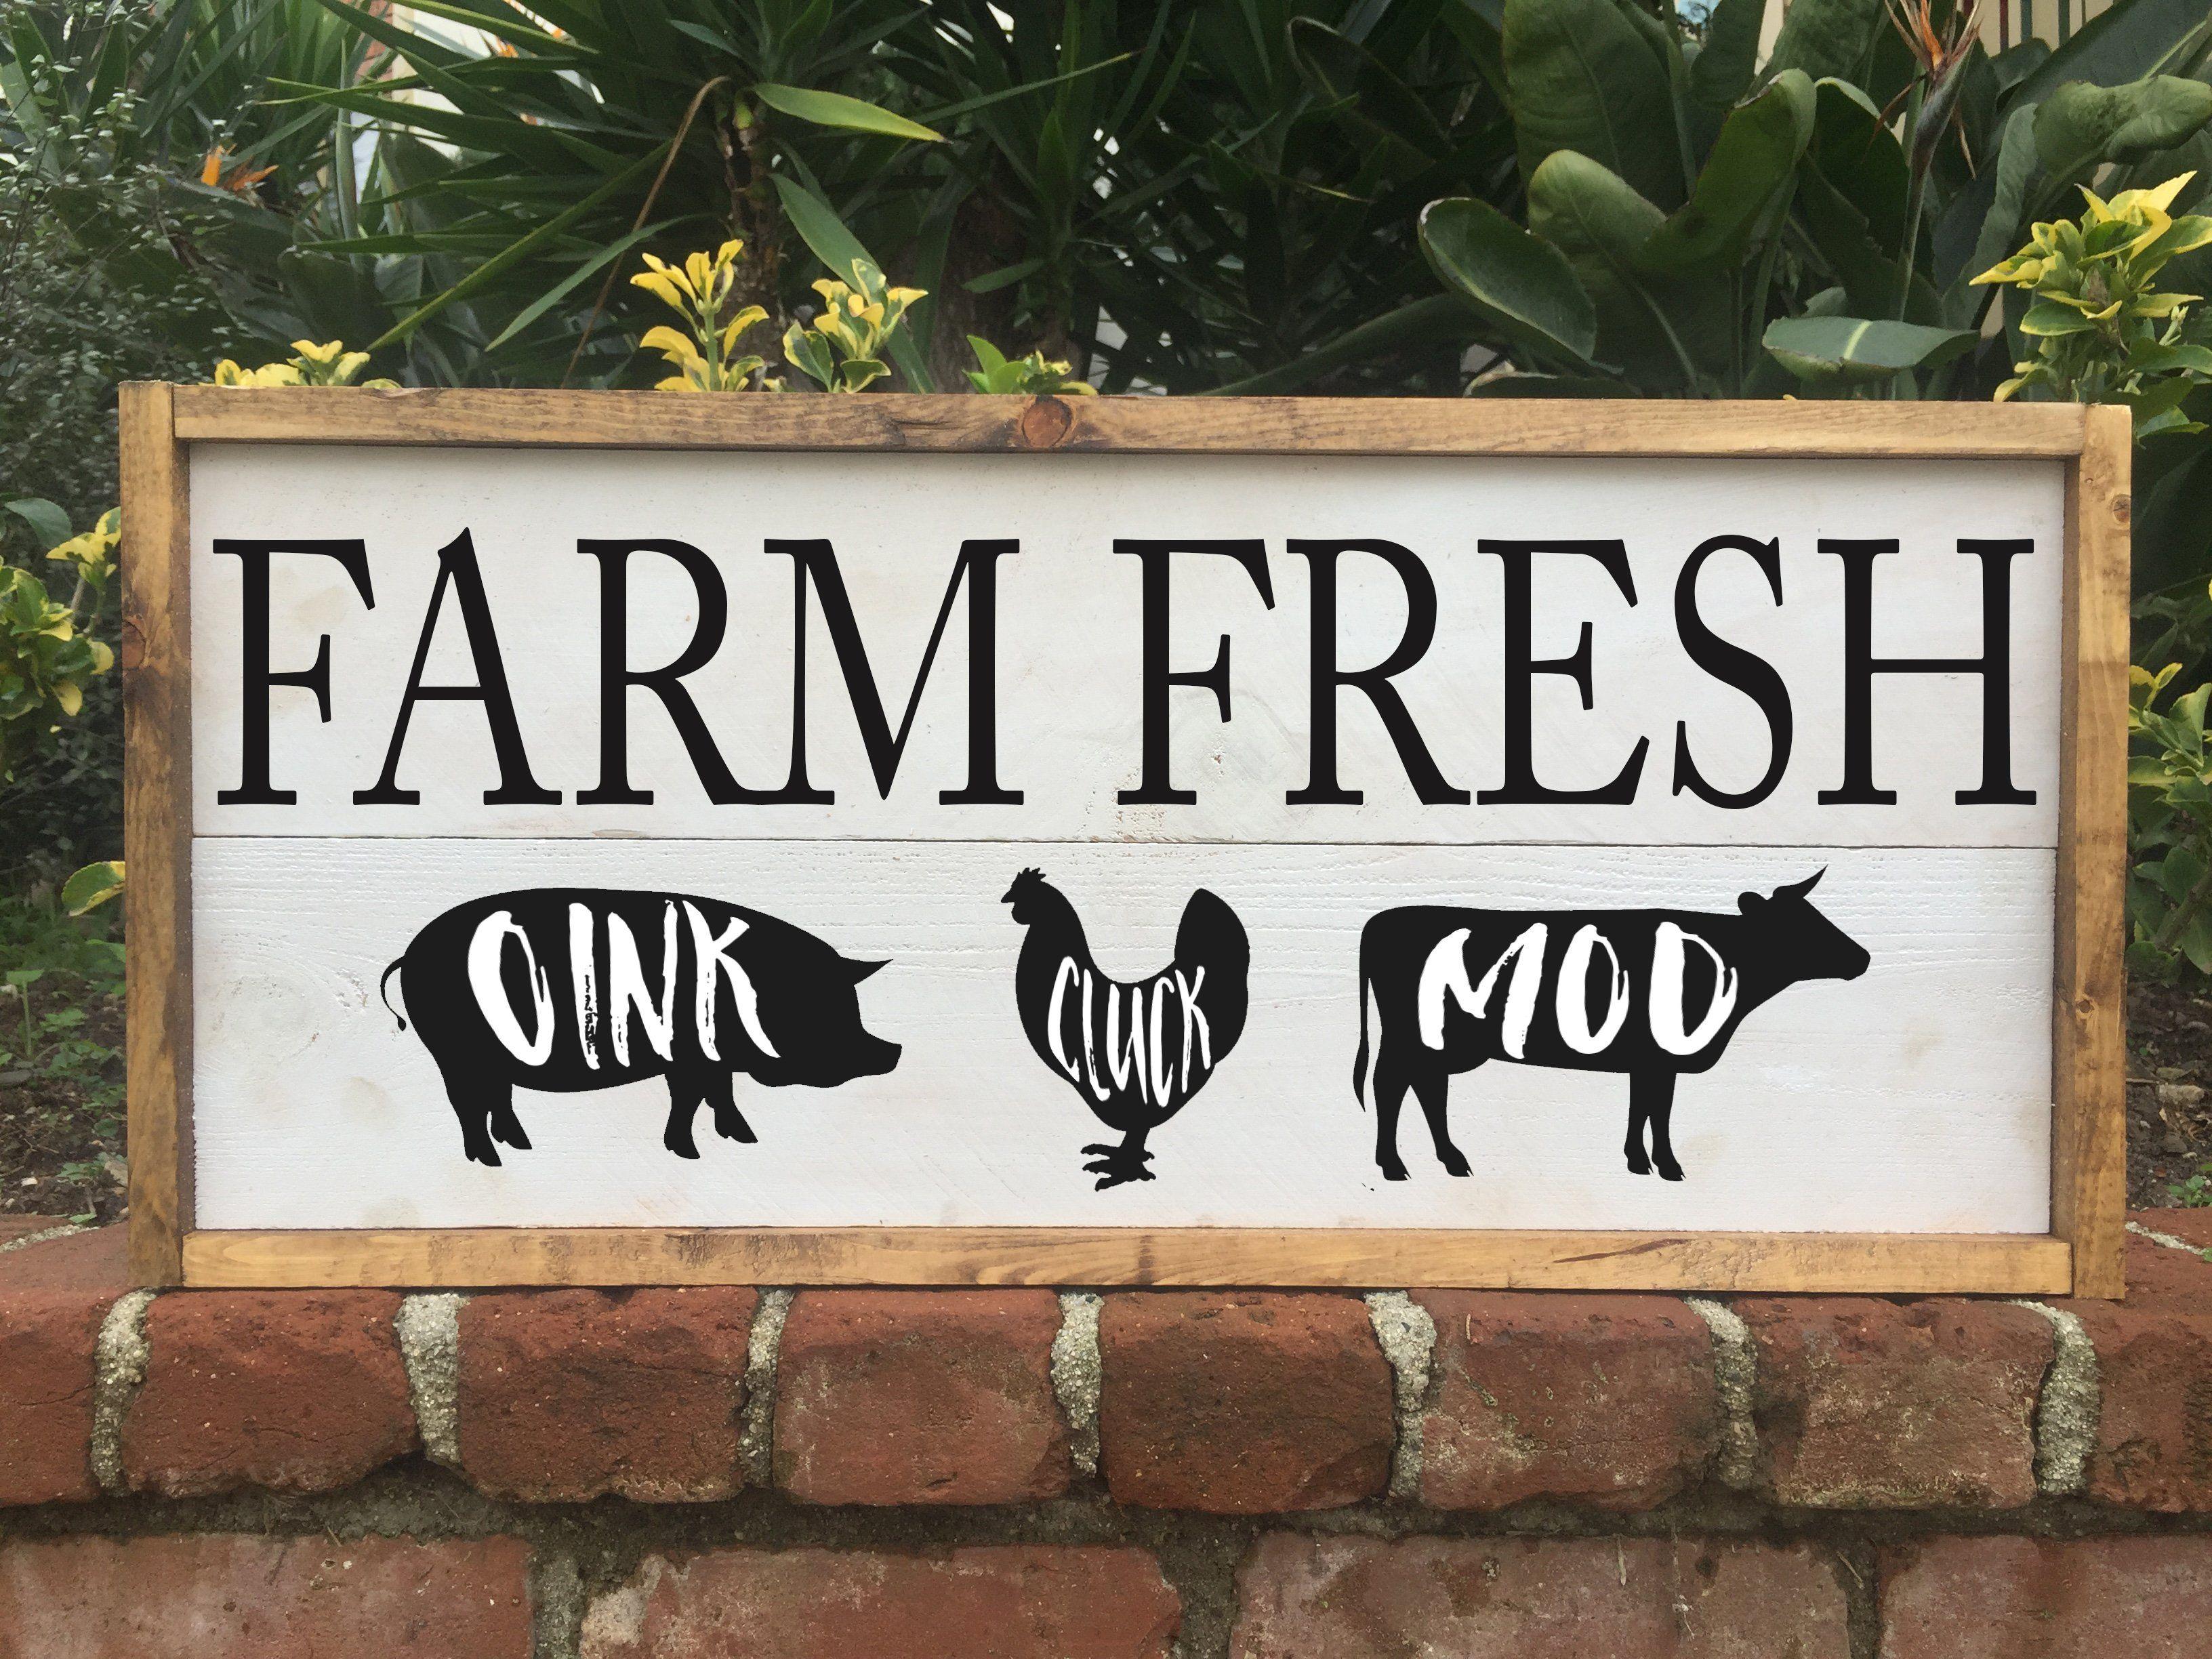 Farm Fresh Produce - Framed Artwork Rustic Home Decor ...